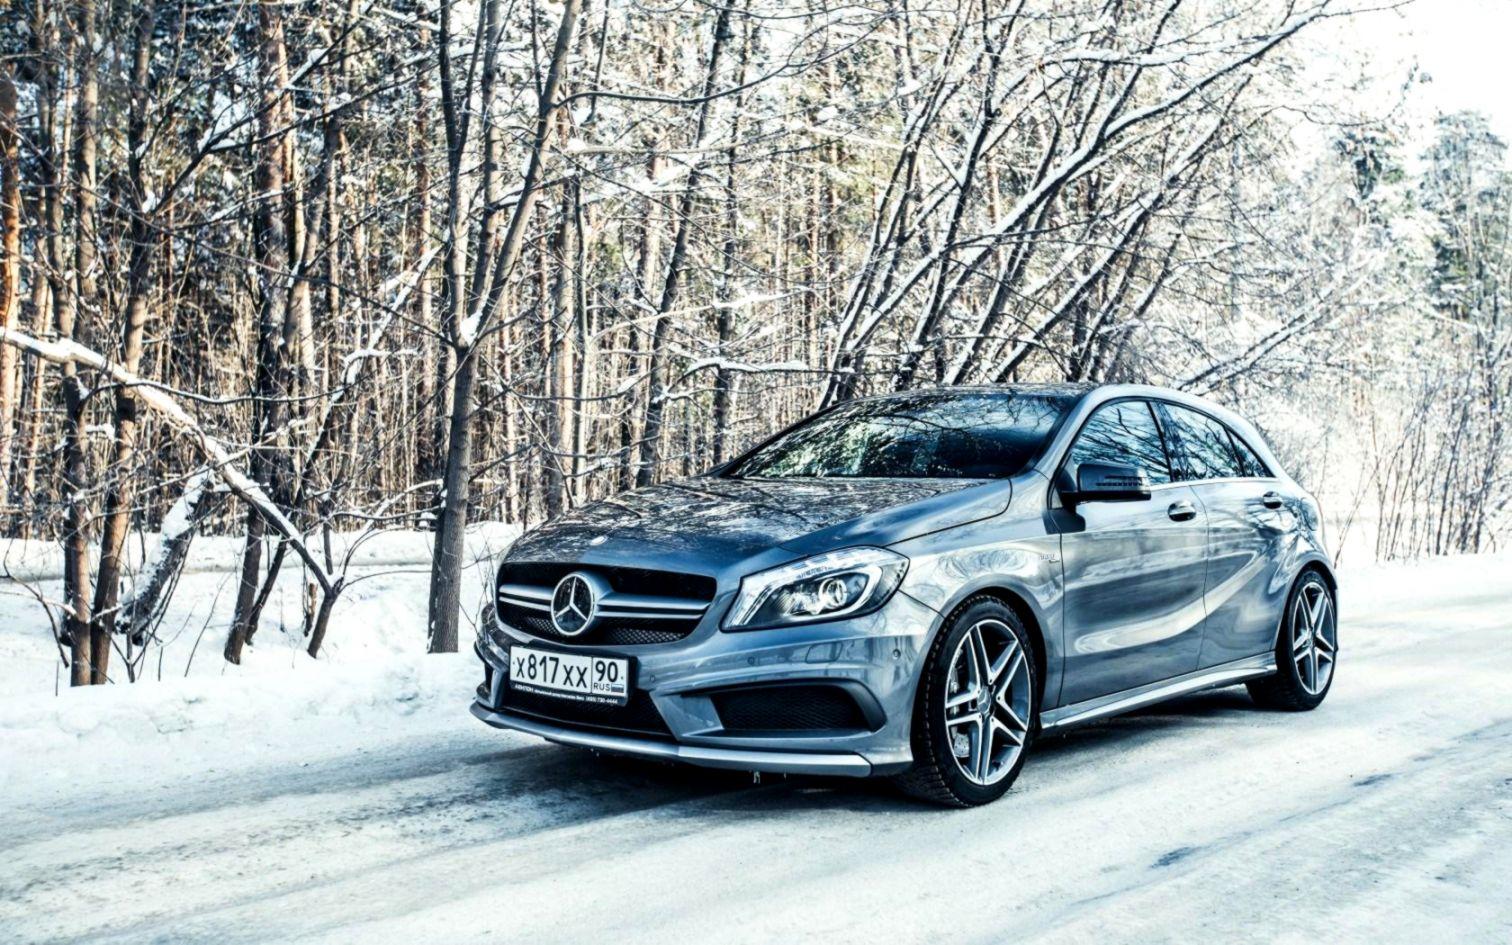 Mercedes Benz Snow Desktop Background Wallpapers Hd